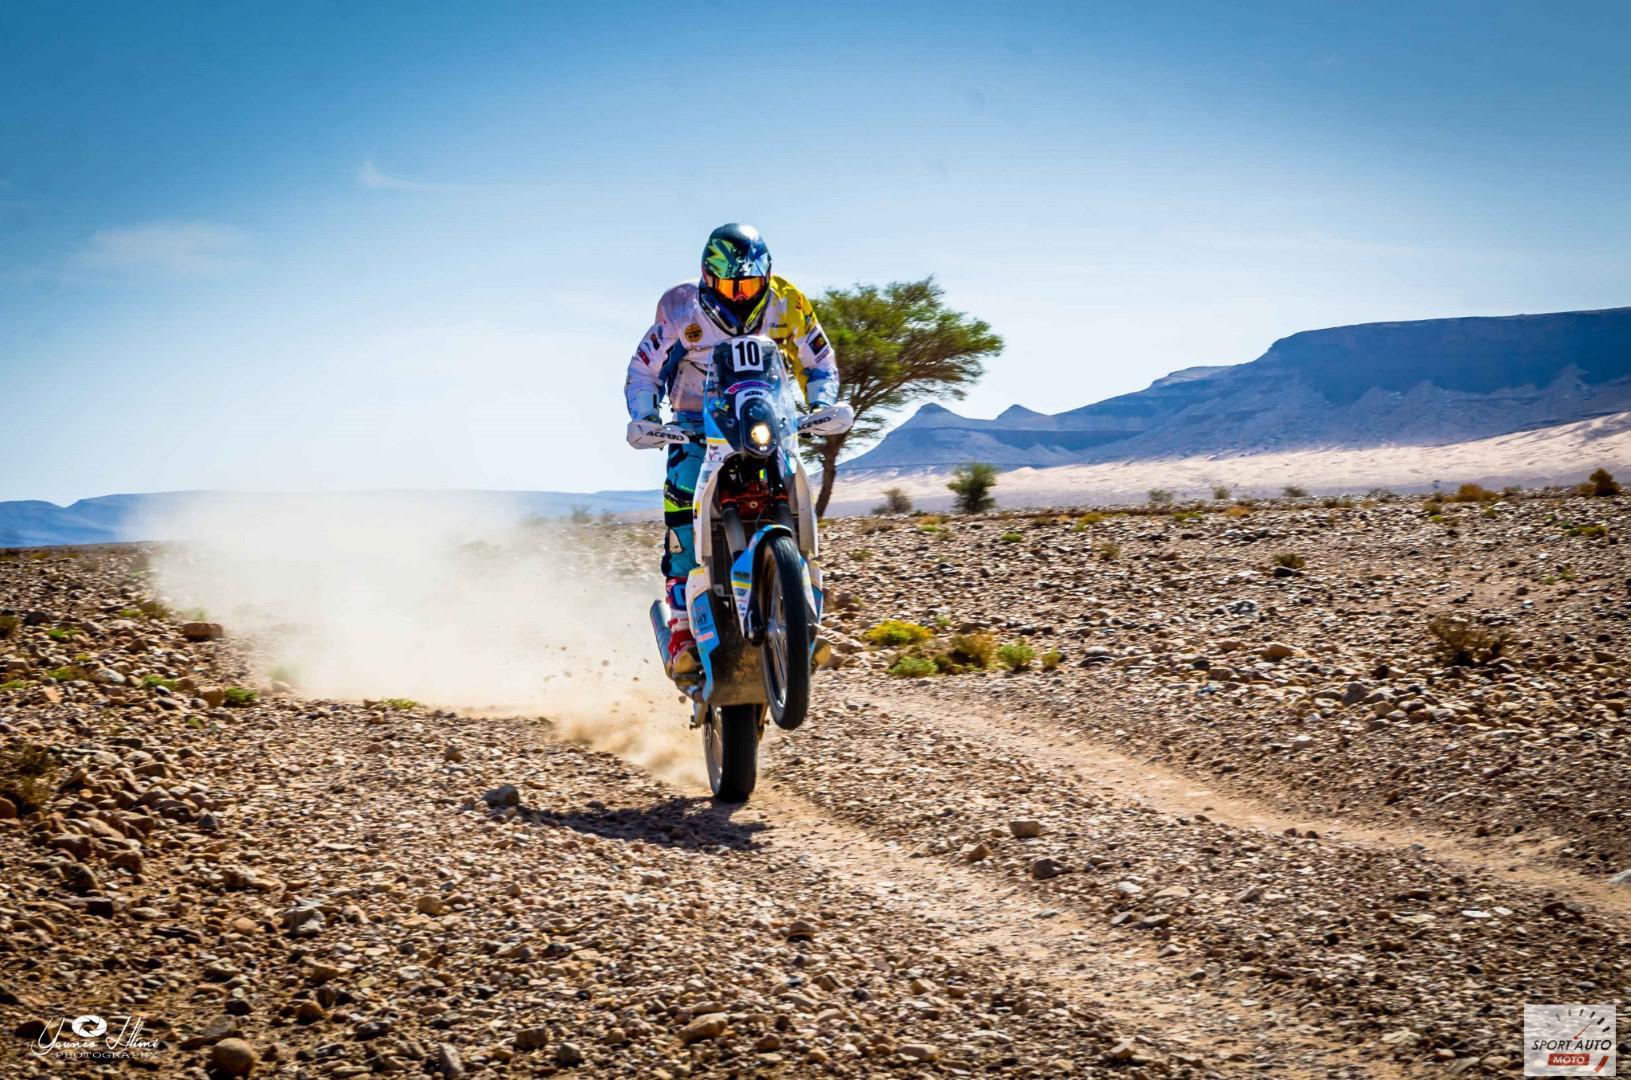 rallye-hearts-of-morrocco-2017-lionel-baud-vainqueur-du-jour-444-5.jpg